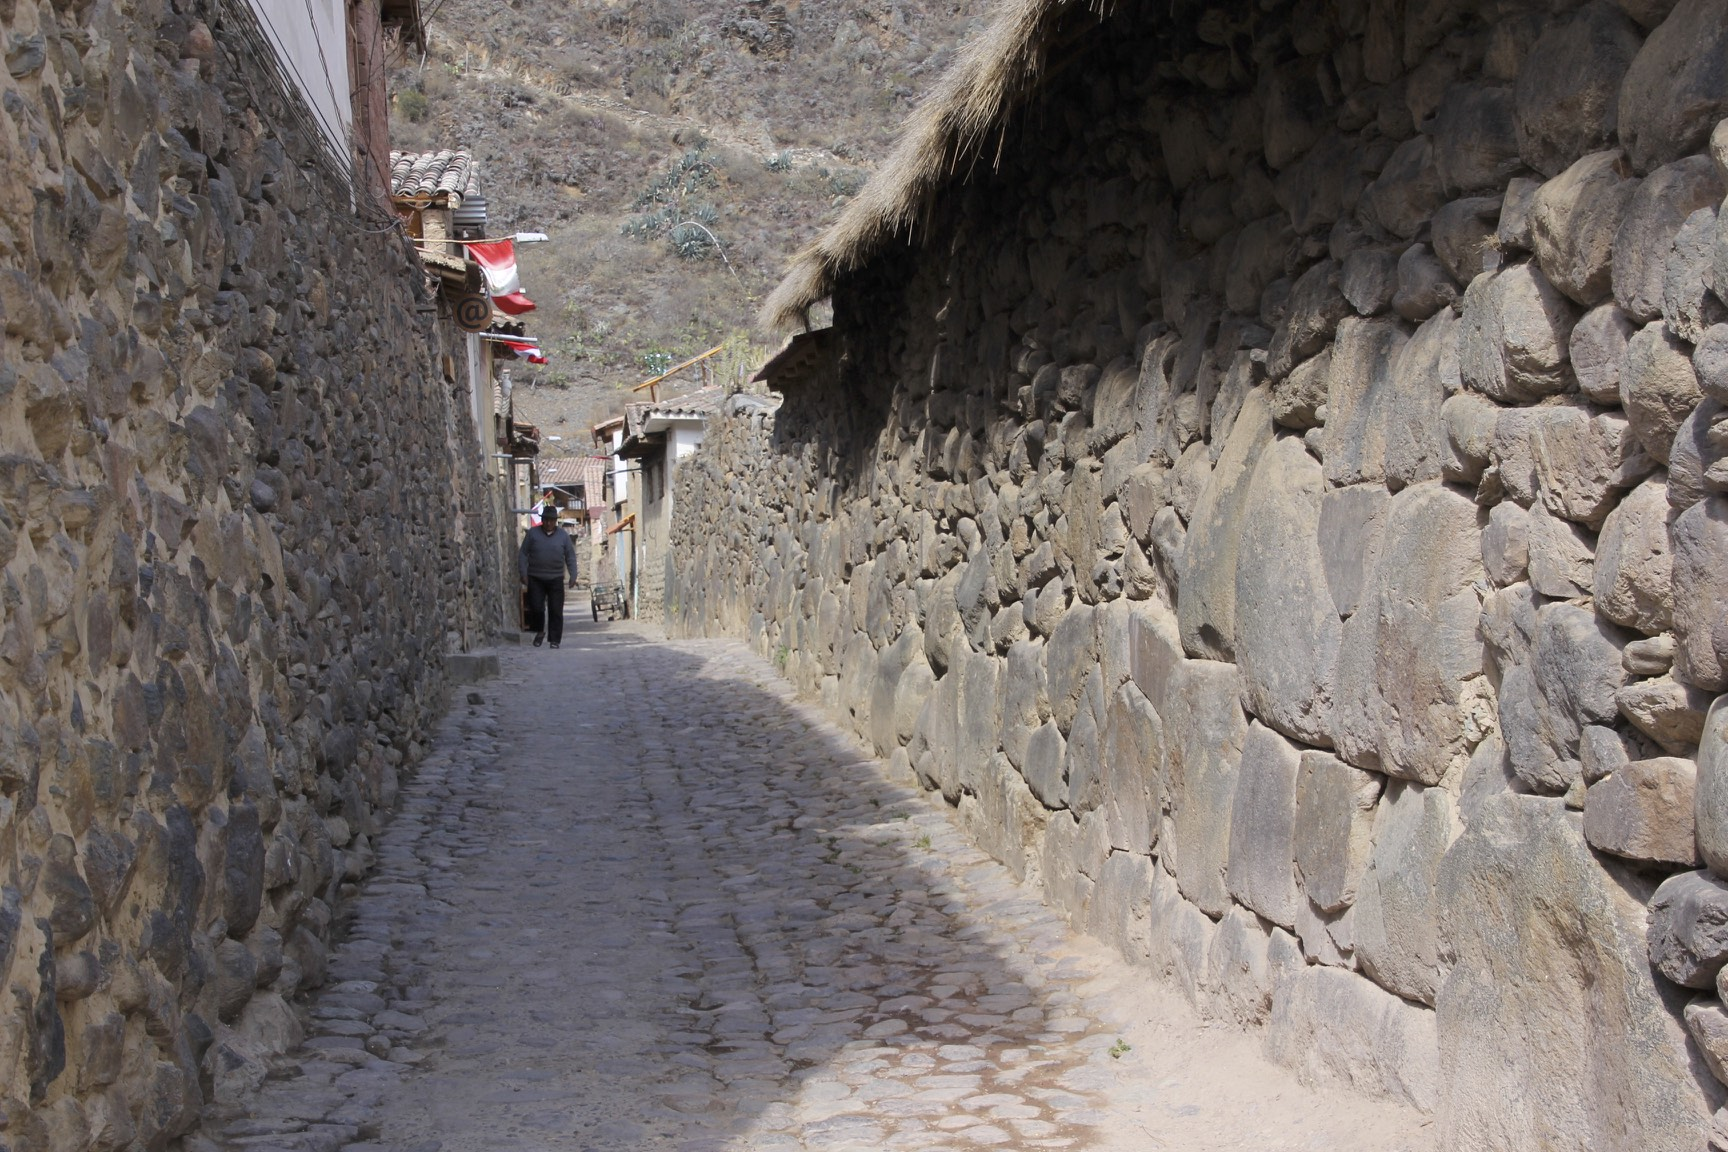 Old Inca town of Ollantaytambo